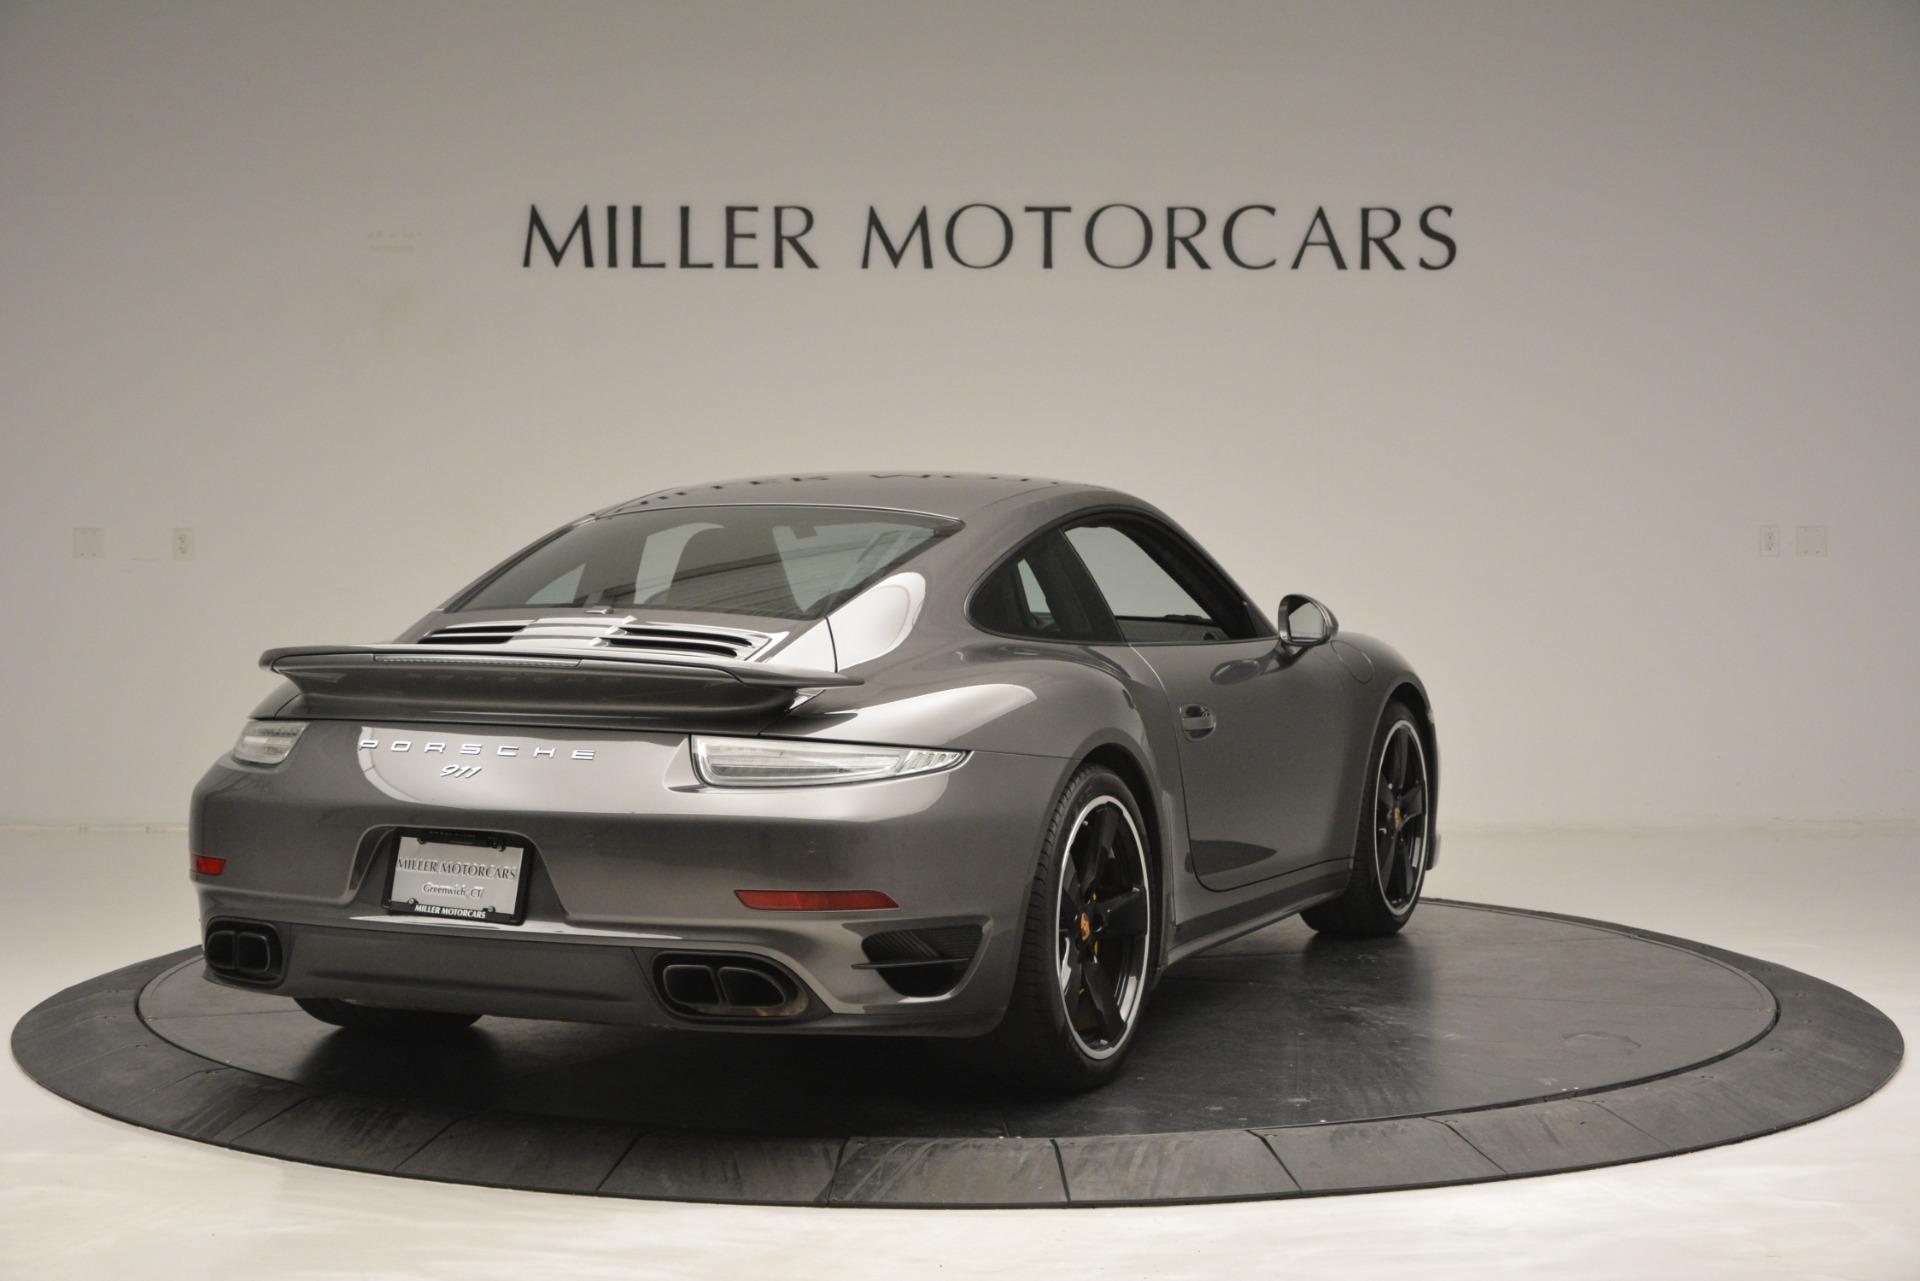 Used 2015 Porsche 911 Turbo S For Sale In Greenwich, CT 2923_p7